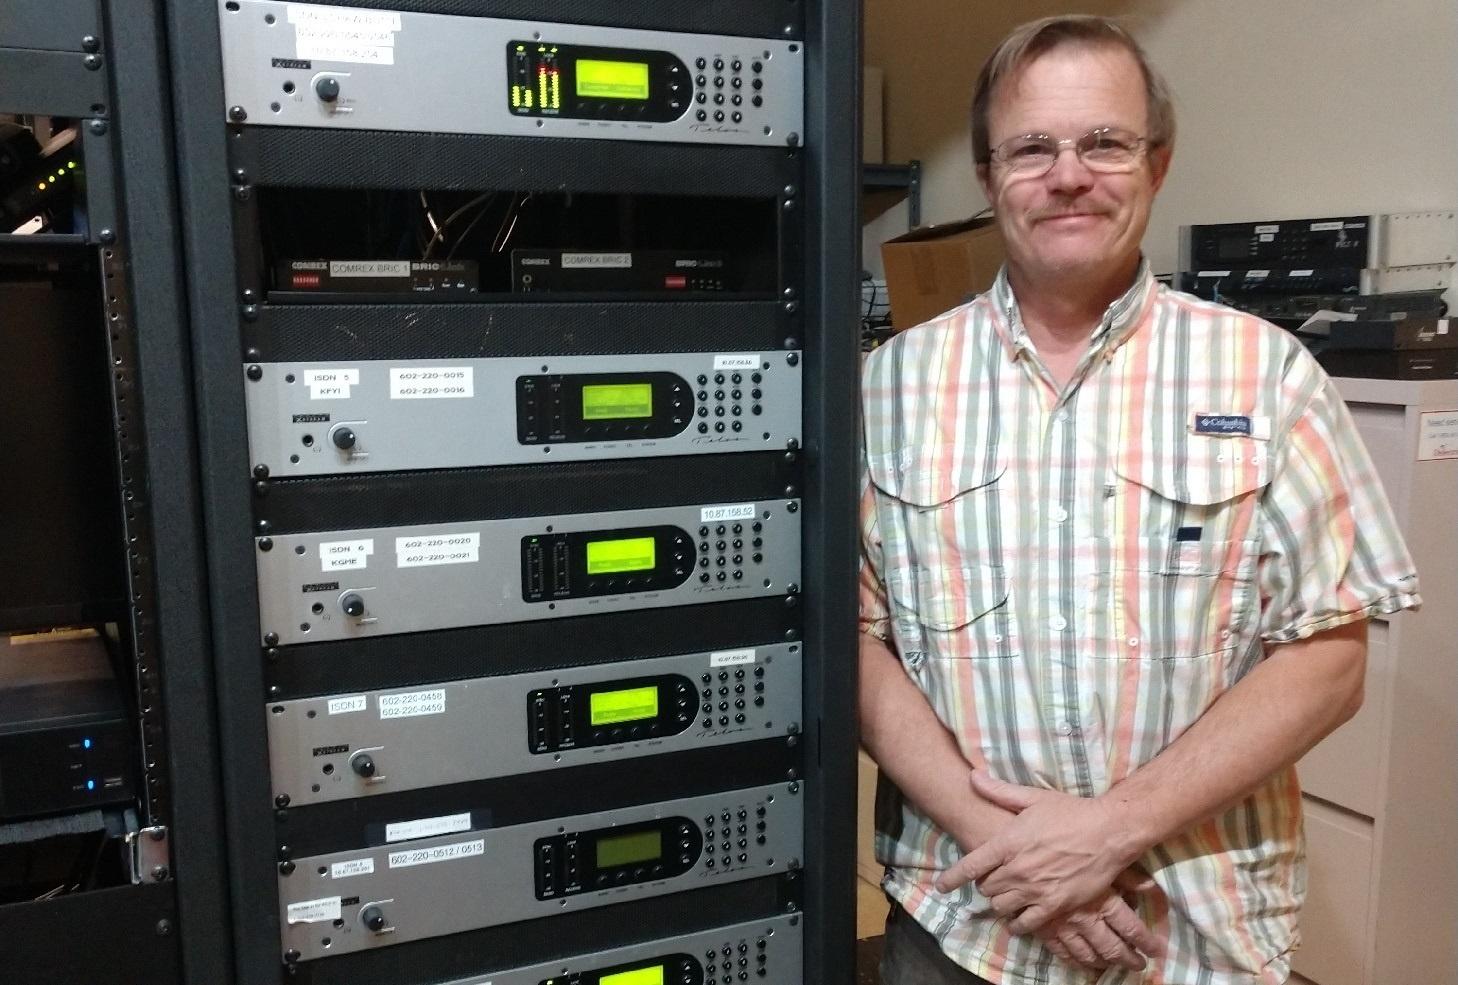 Scot McDougal with a rack of Telos Zephyrs at iHeart Phoenix